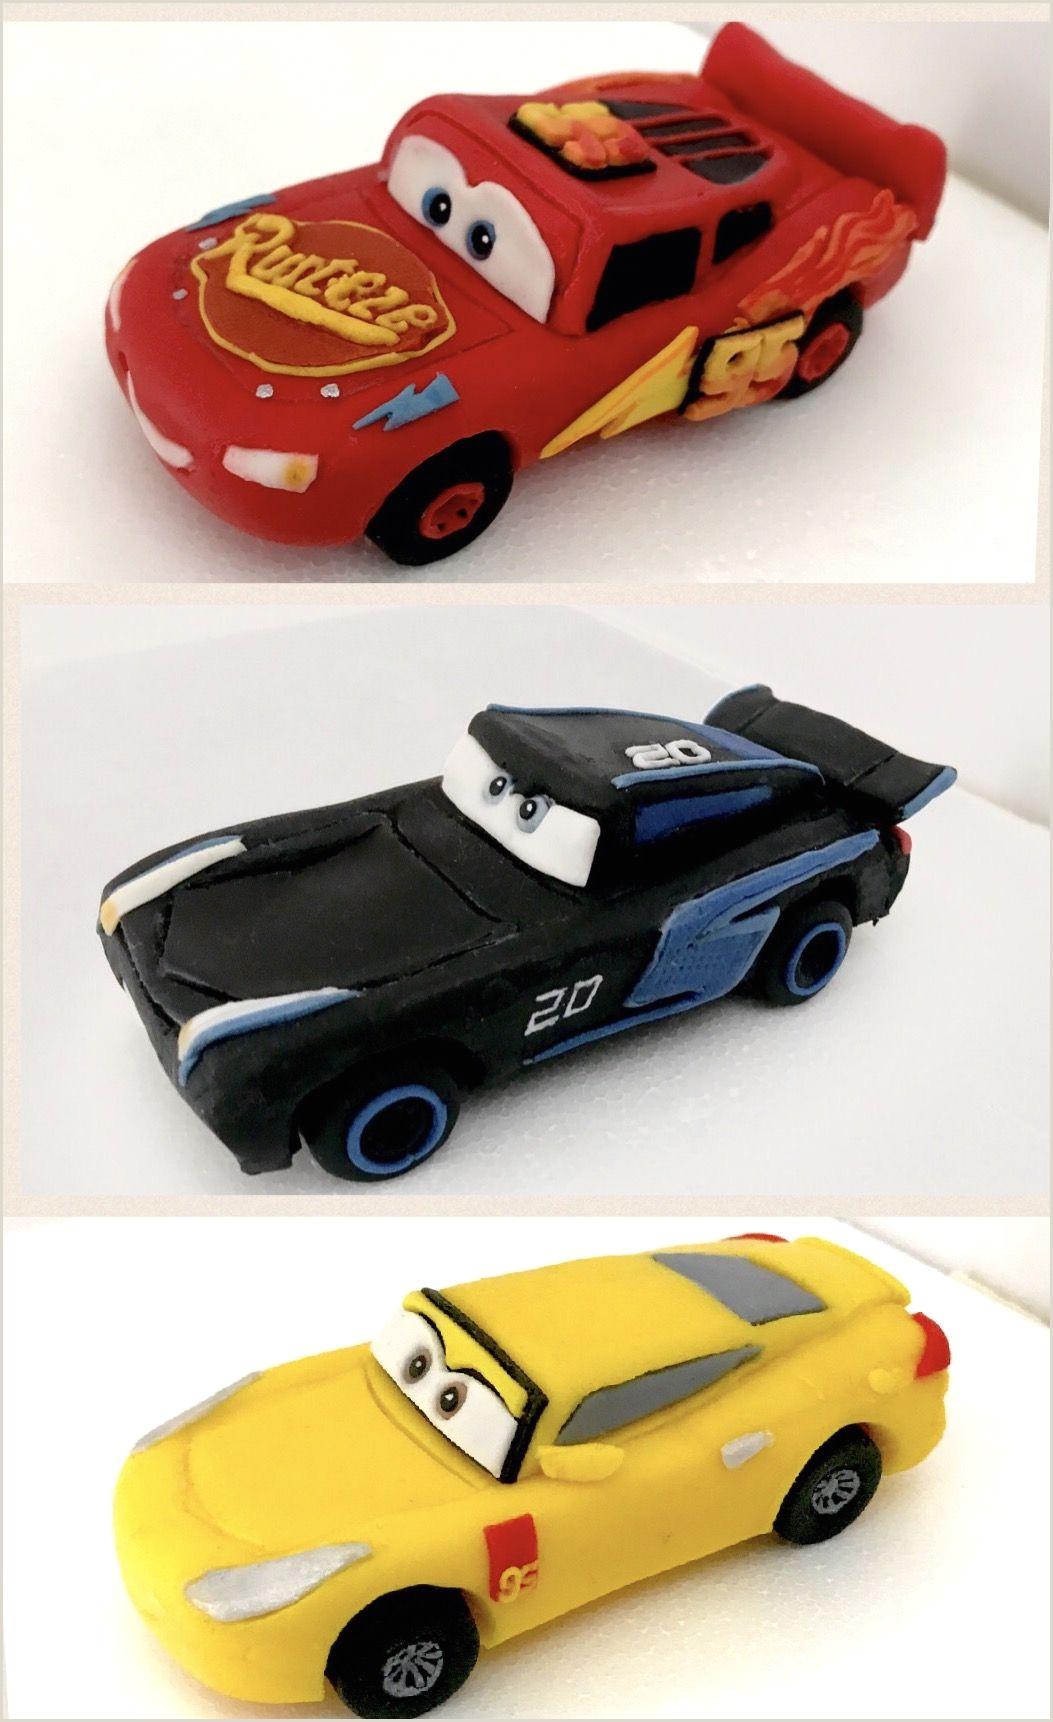 Cars 3 Lightning McQueen Jackson Storm and Cruz Ramirez